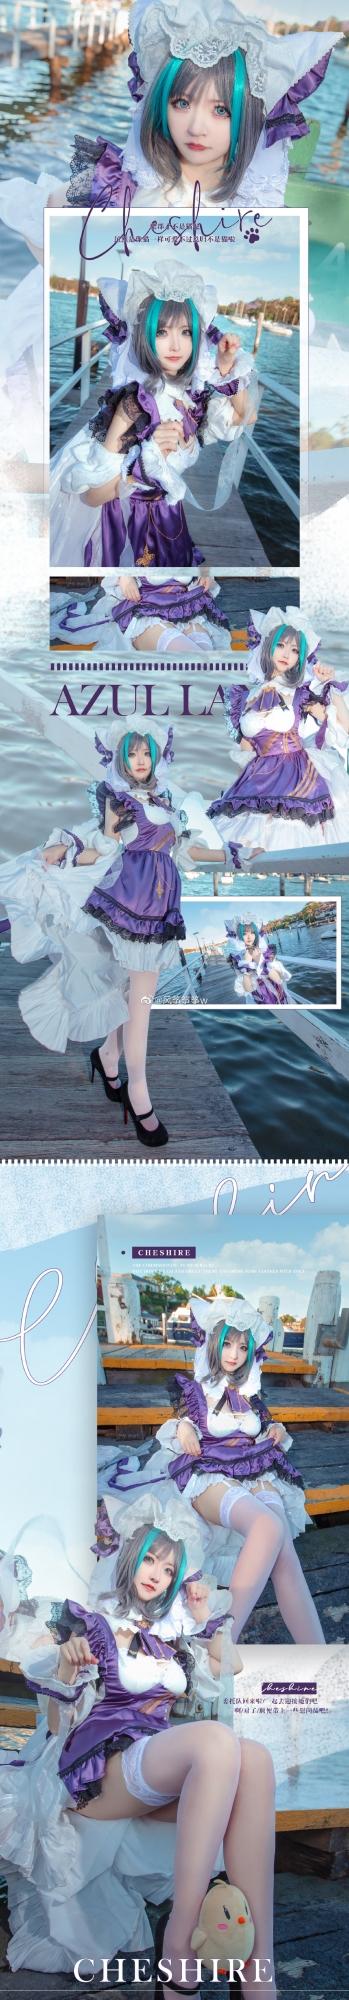 [COS]碧蓝航线   柴郡   @风筝筝筝w (9P) -cosplay王国图片插图